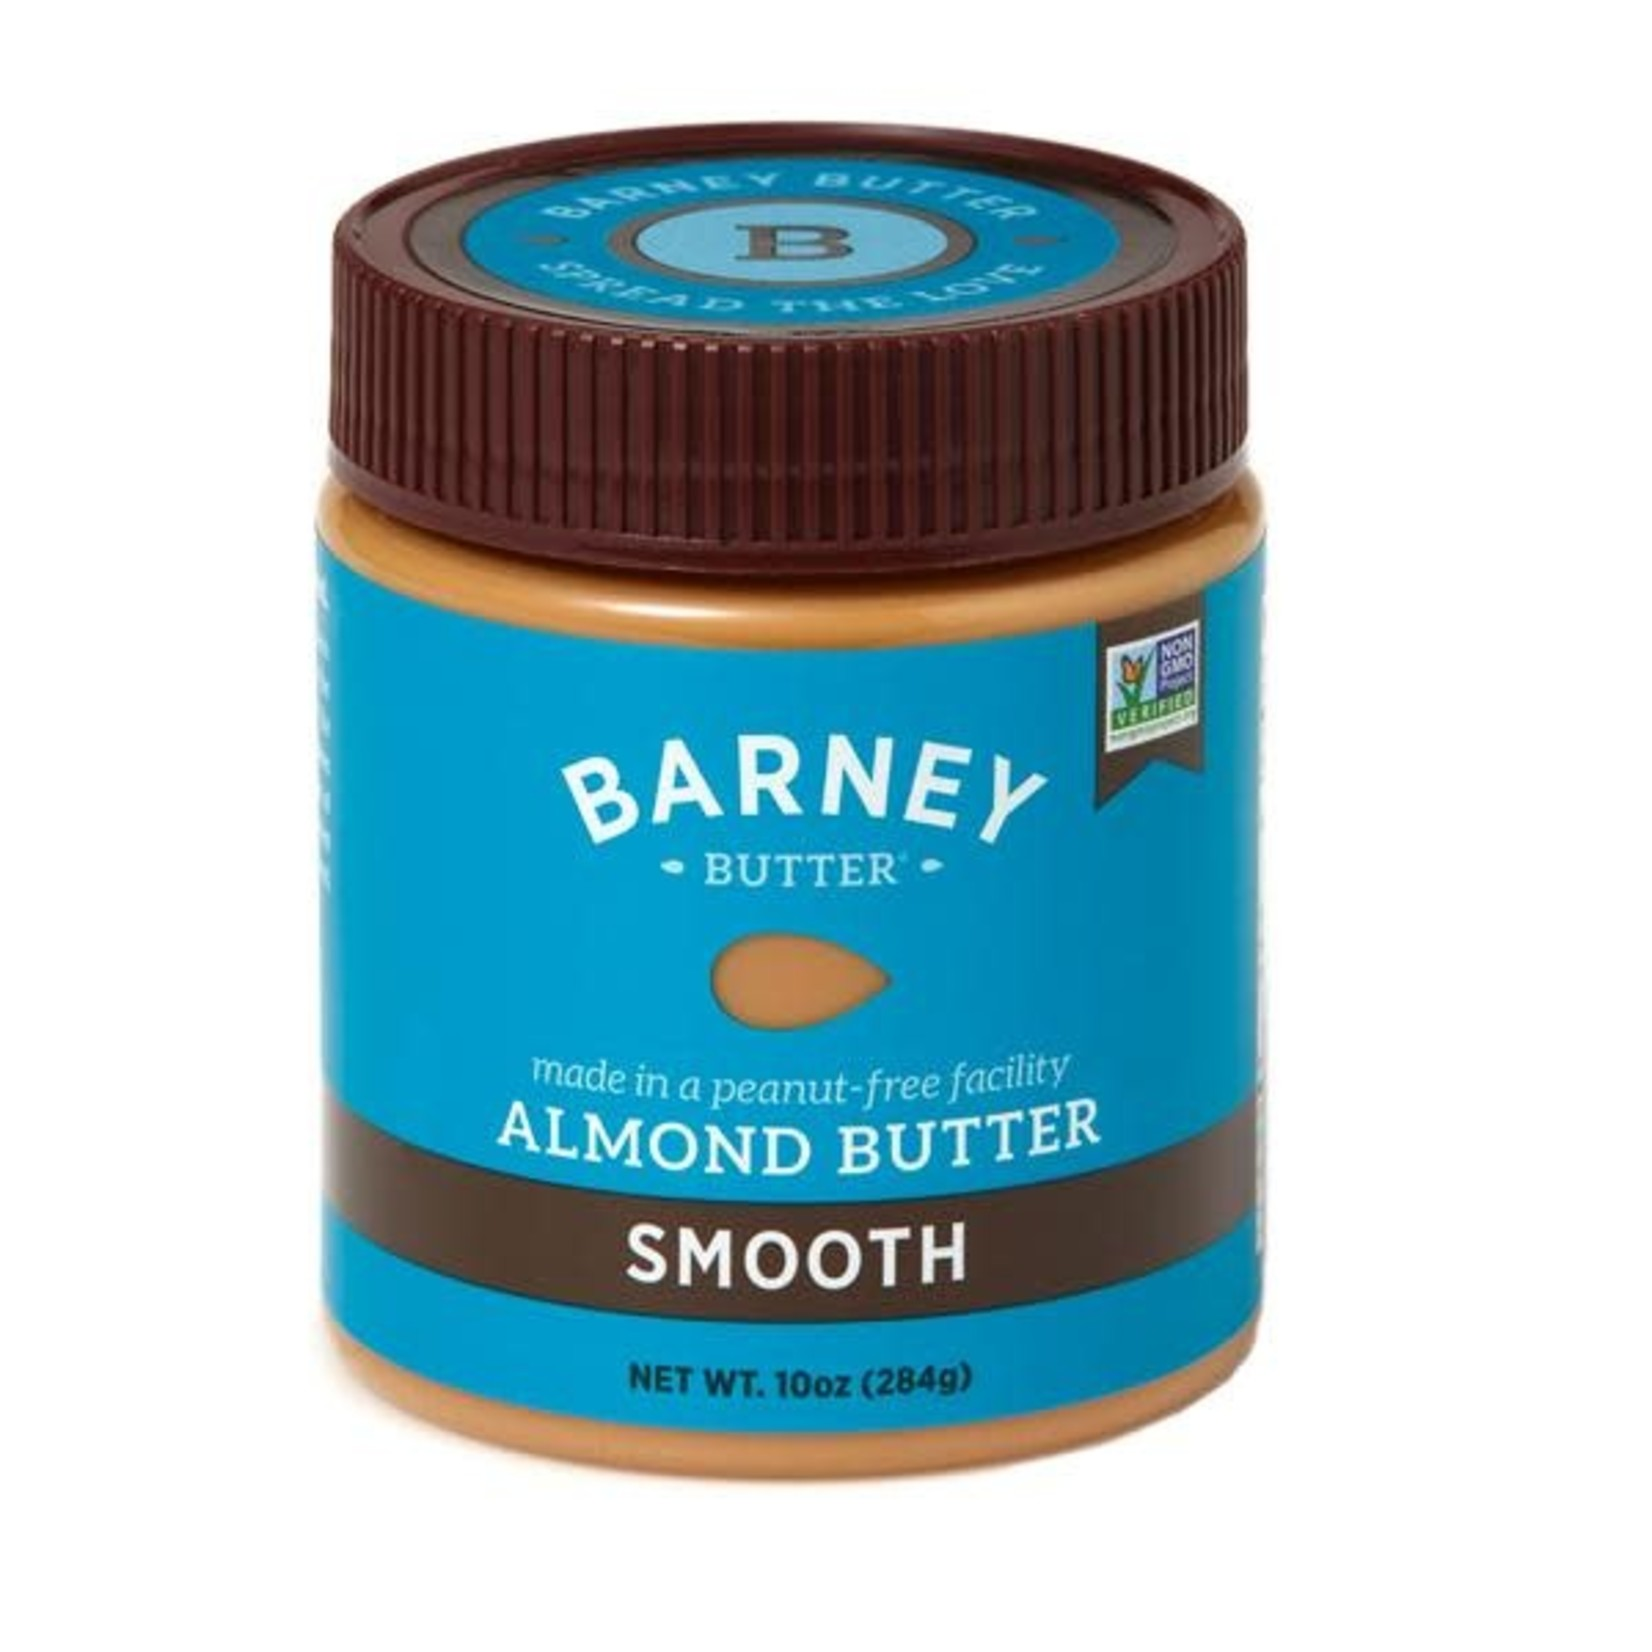 Barney Butter Barney Butter Smooth